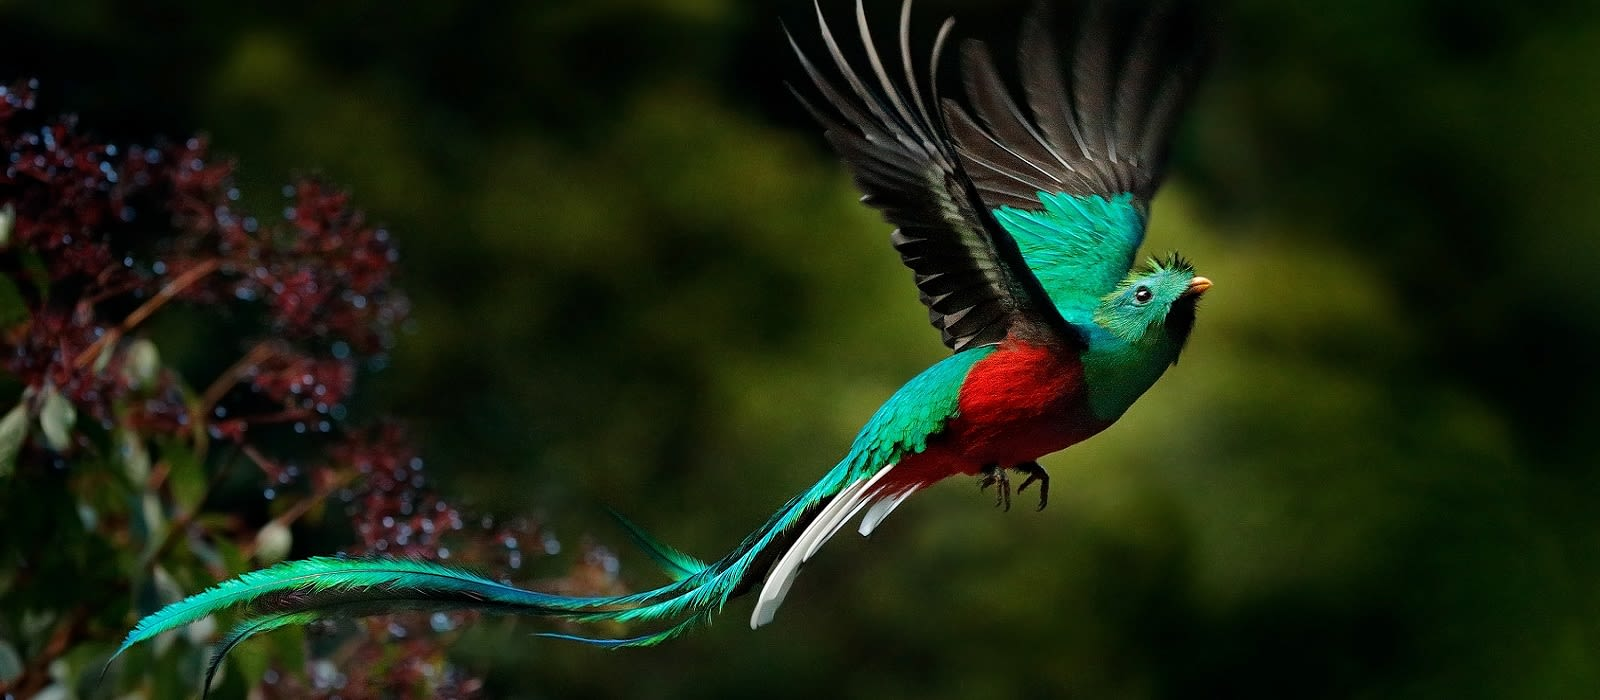 Exotische Vögel & Bezaubernde Landschaften – Vogelbeobachtung in Guatemala Urlaub 5